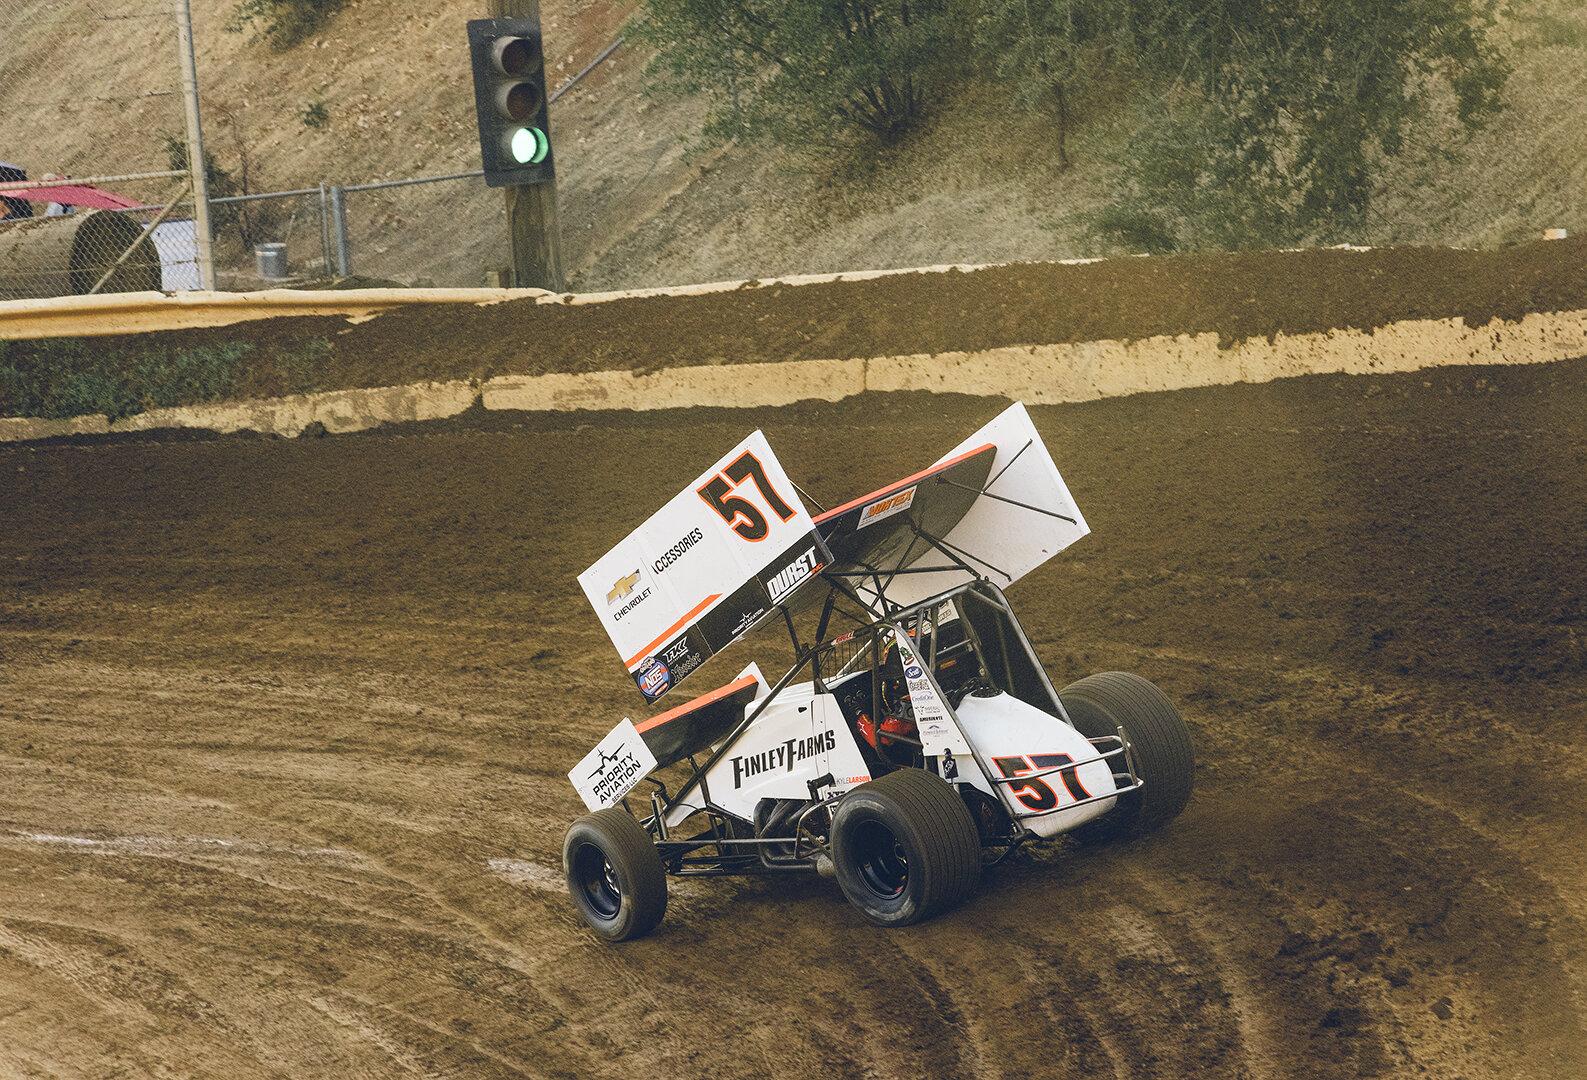 Larson makes a qualifying run in the Sylva sprint car.